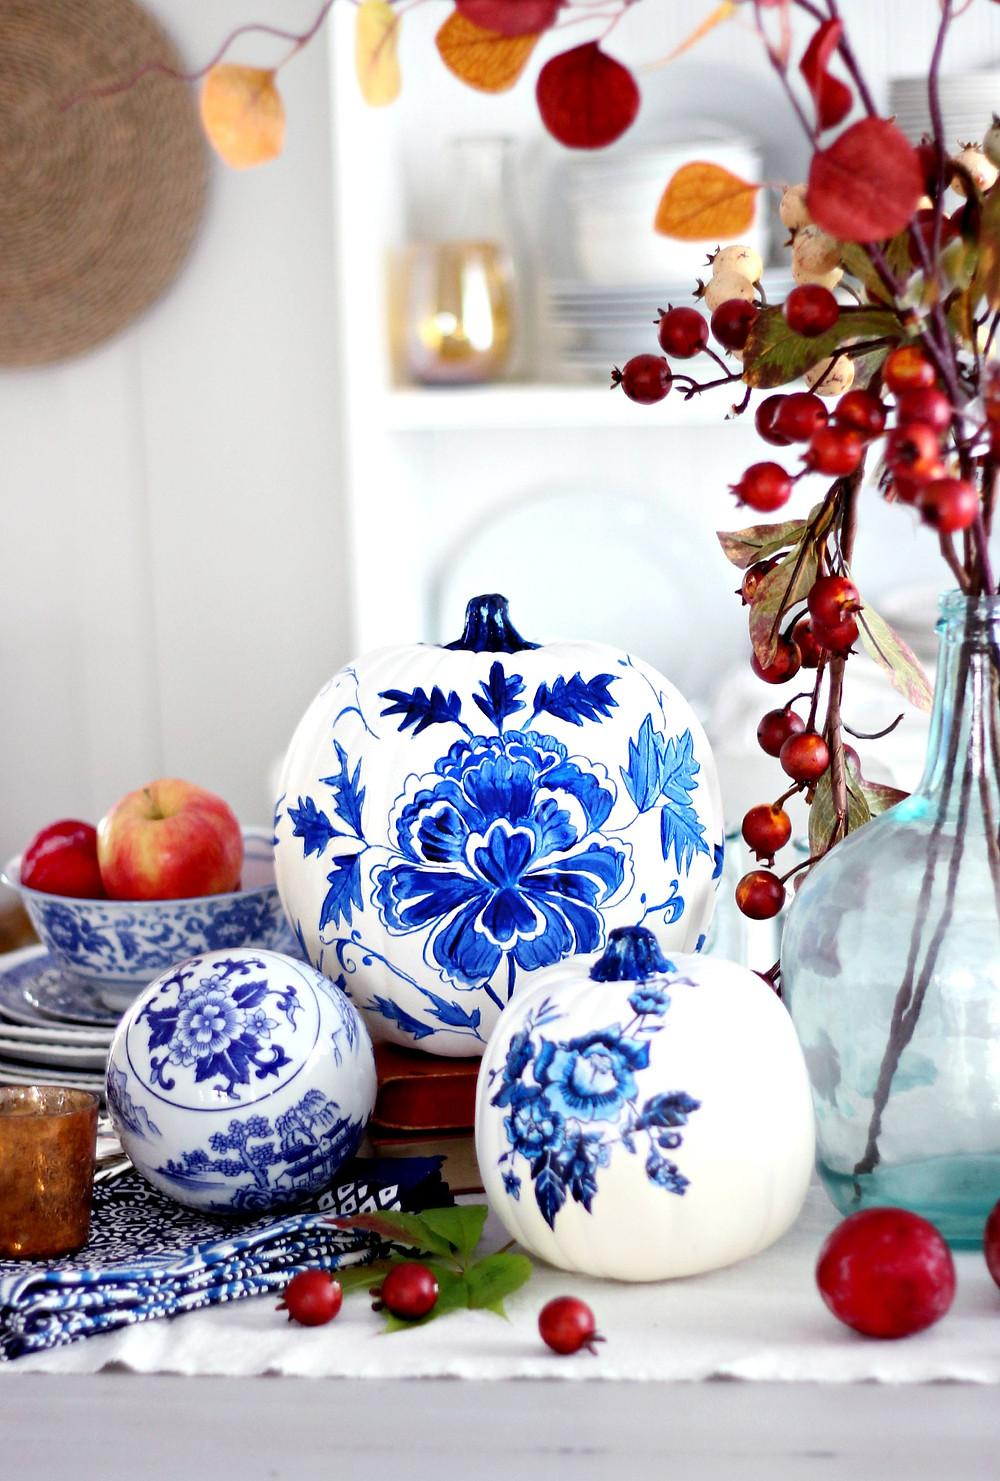 10+1 ELEGANT decor ideas with pumpkins Blue porcelain effect diy painted pumpkin on tabletop